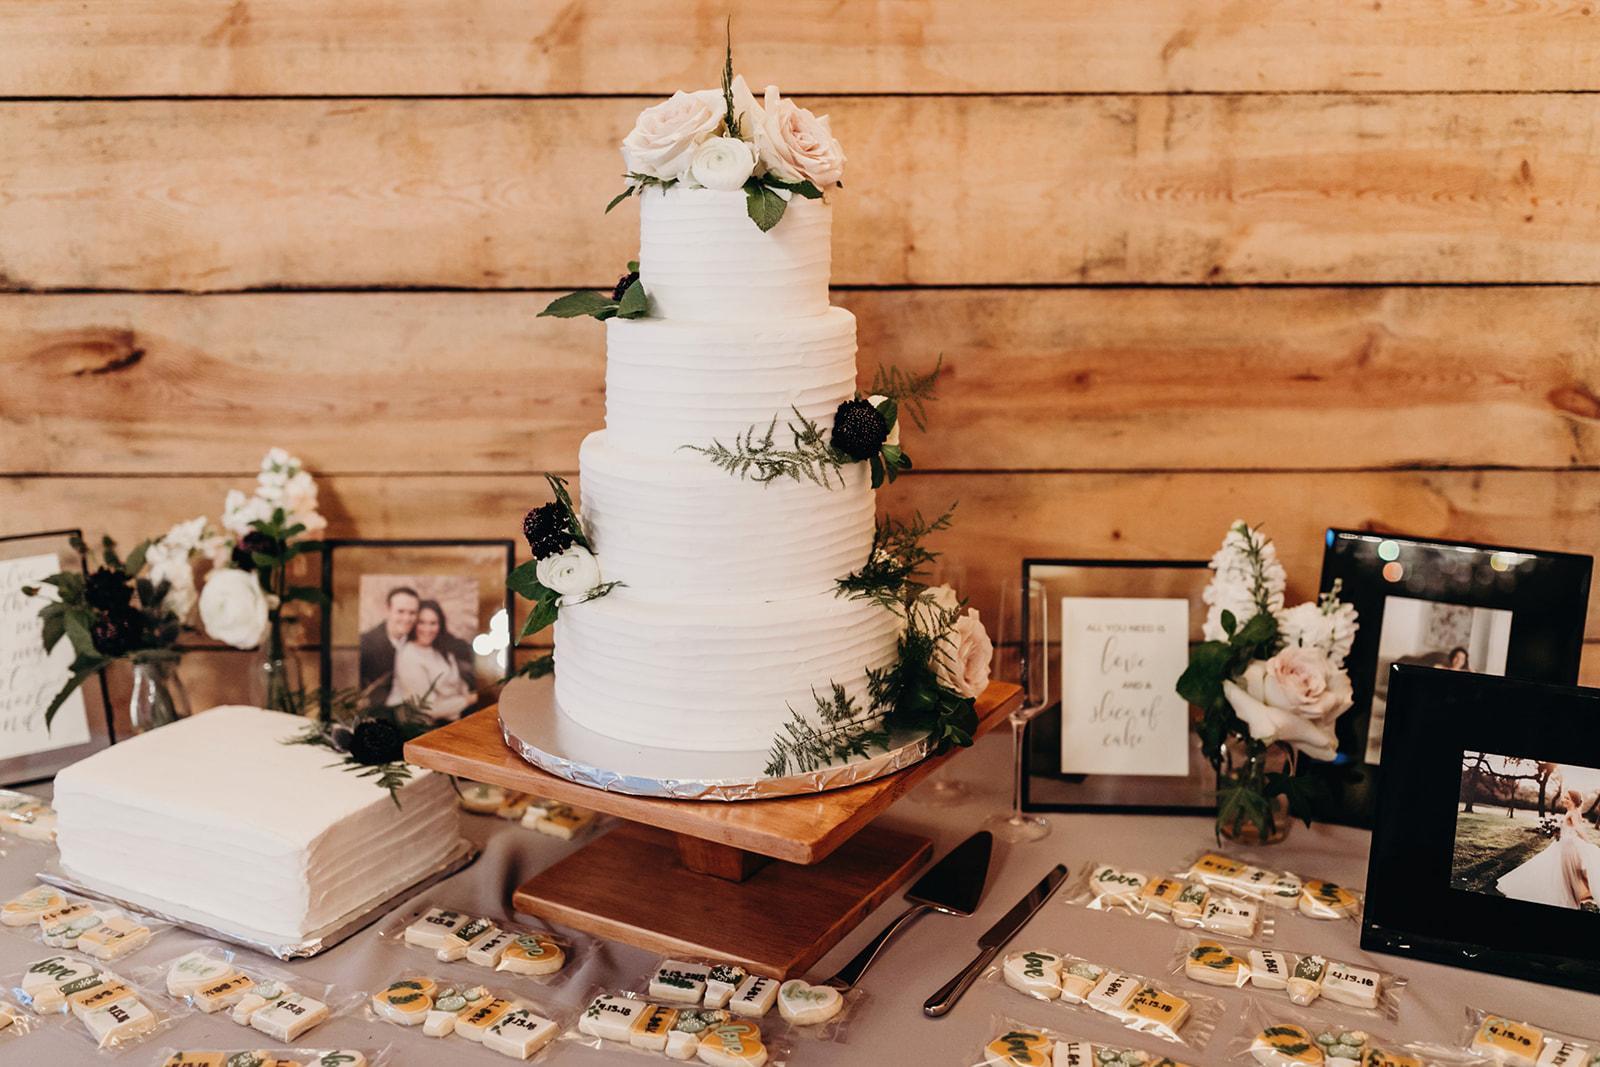 austin-wedding-lindsey-bryce-625.jpg